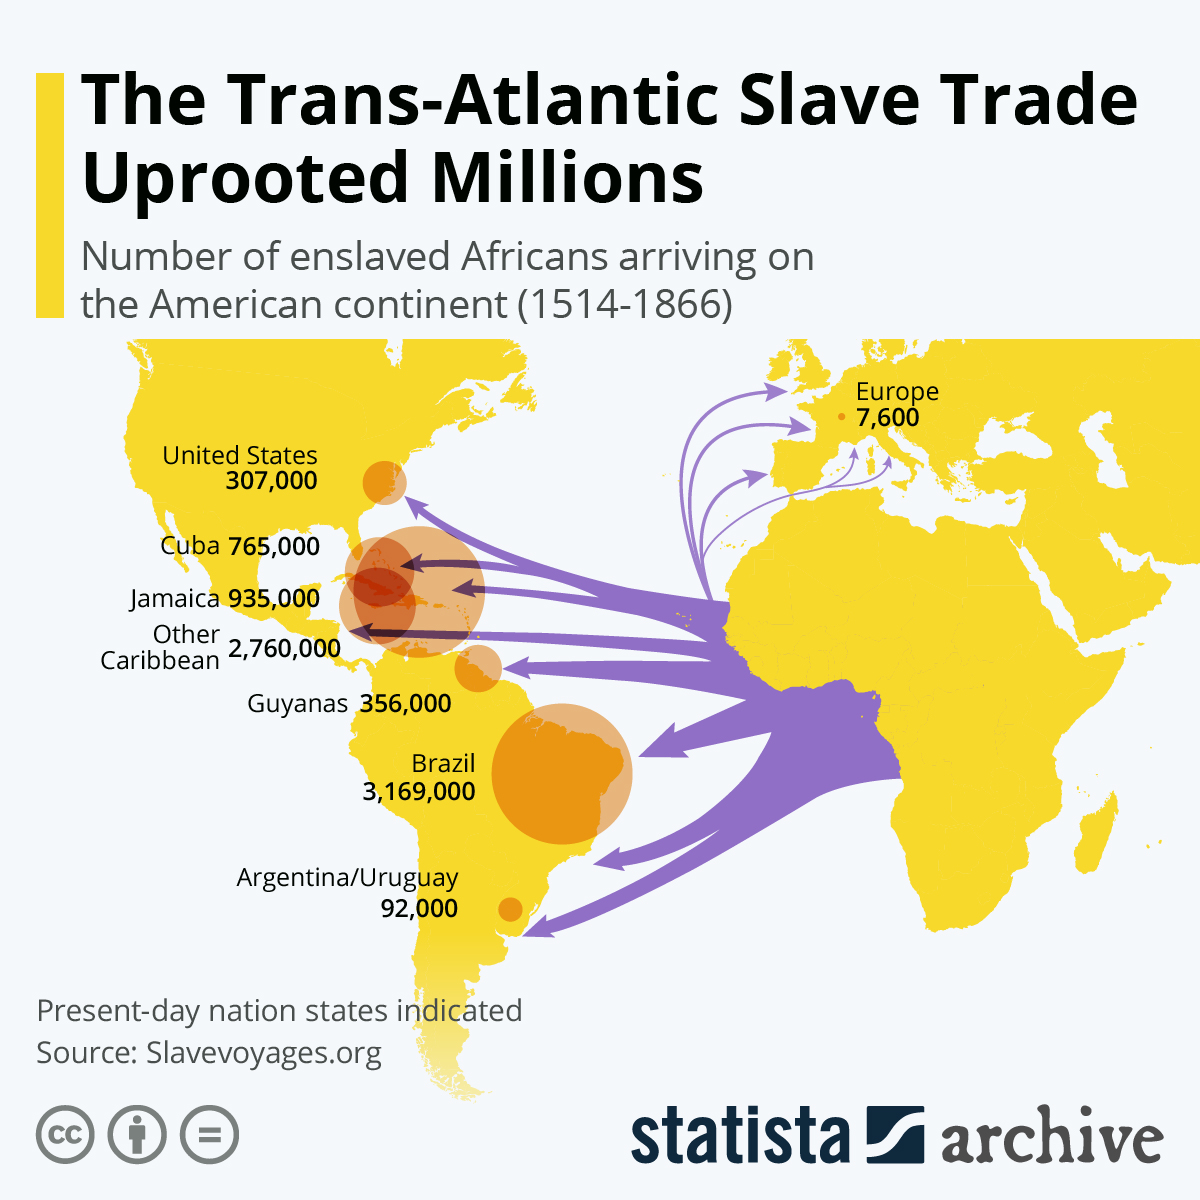 Trans-Atlantic Slave Trade Map